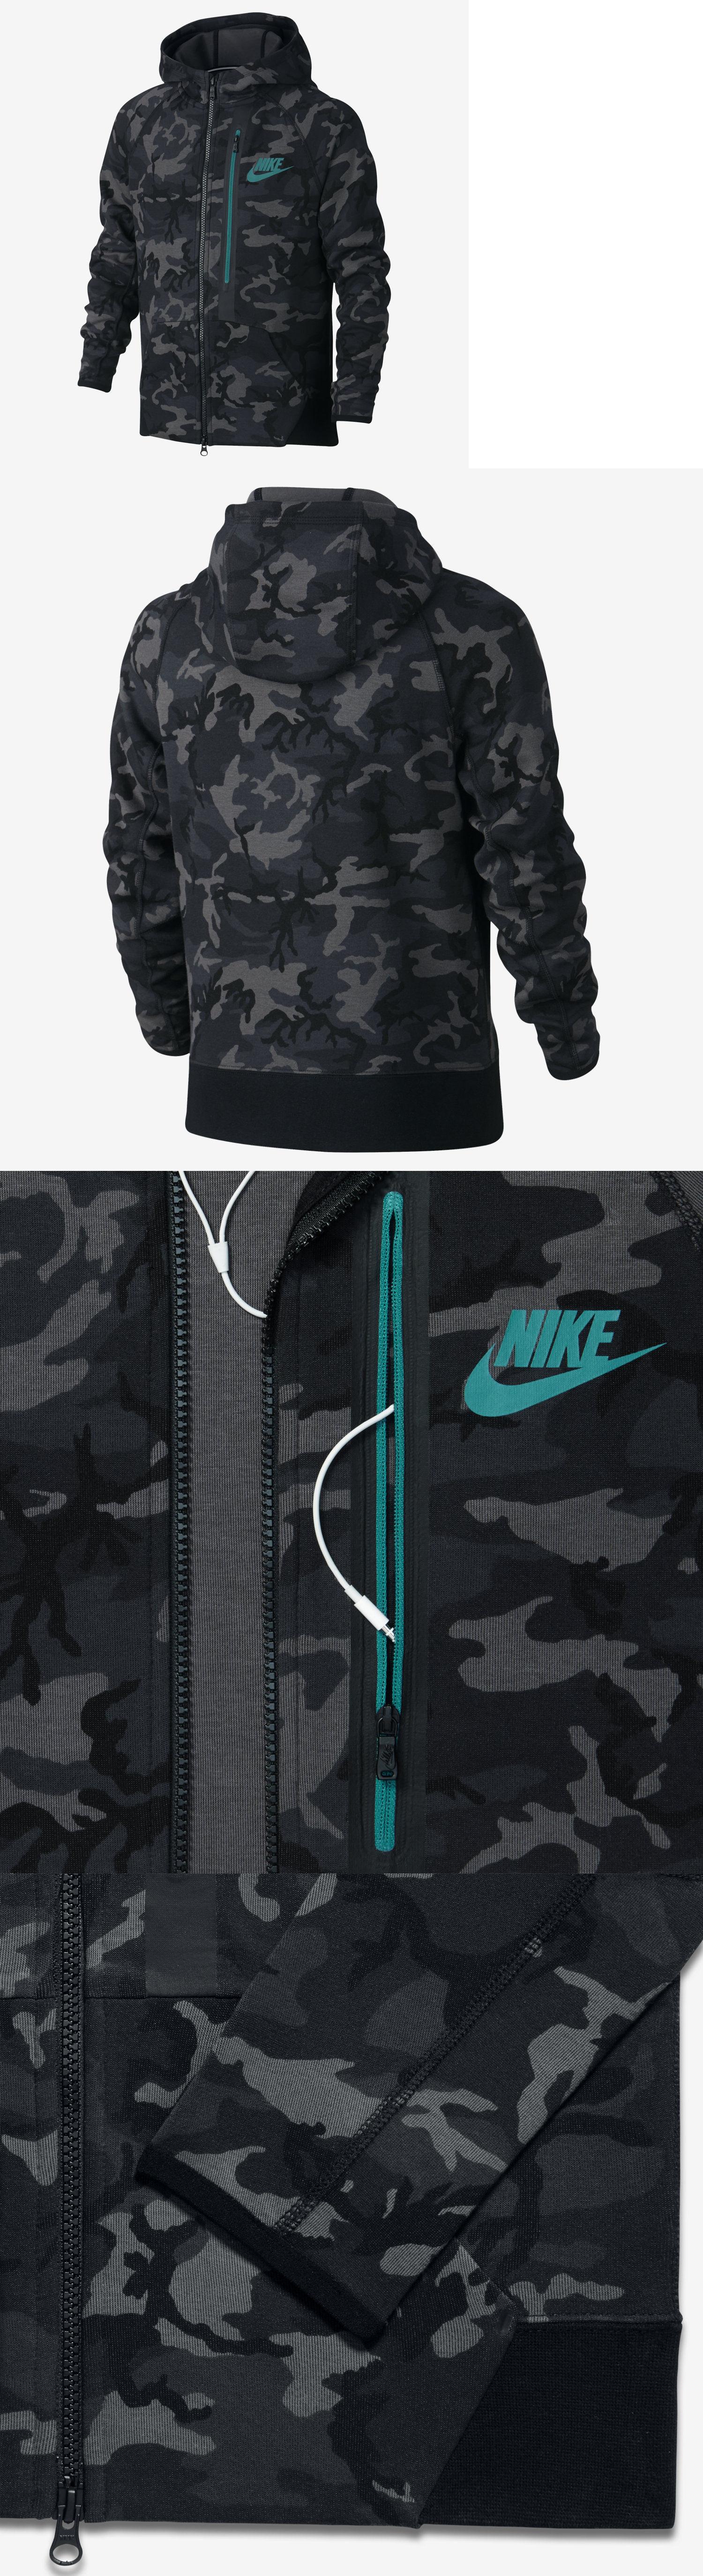 NIKE Youth Boys Tech Fleece Allover Print Full Zip Hoodie Camo Grey